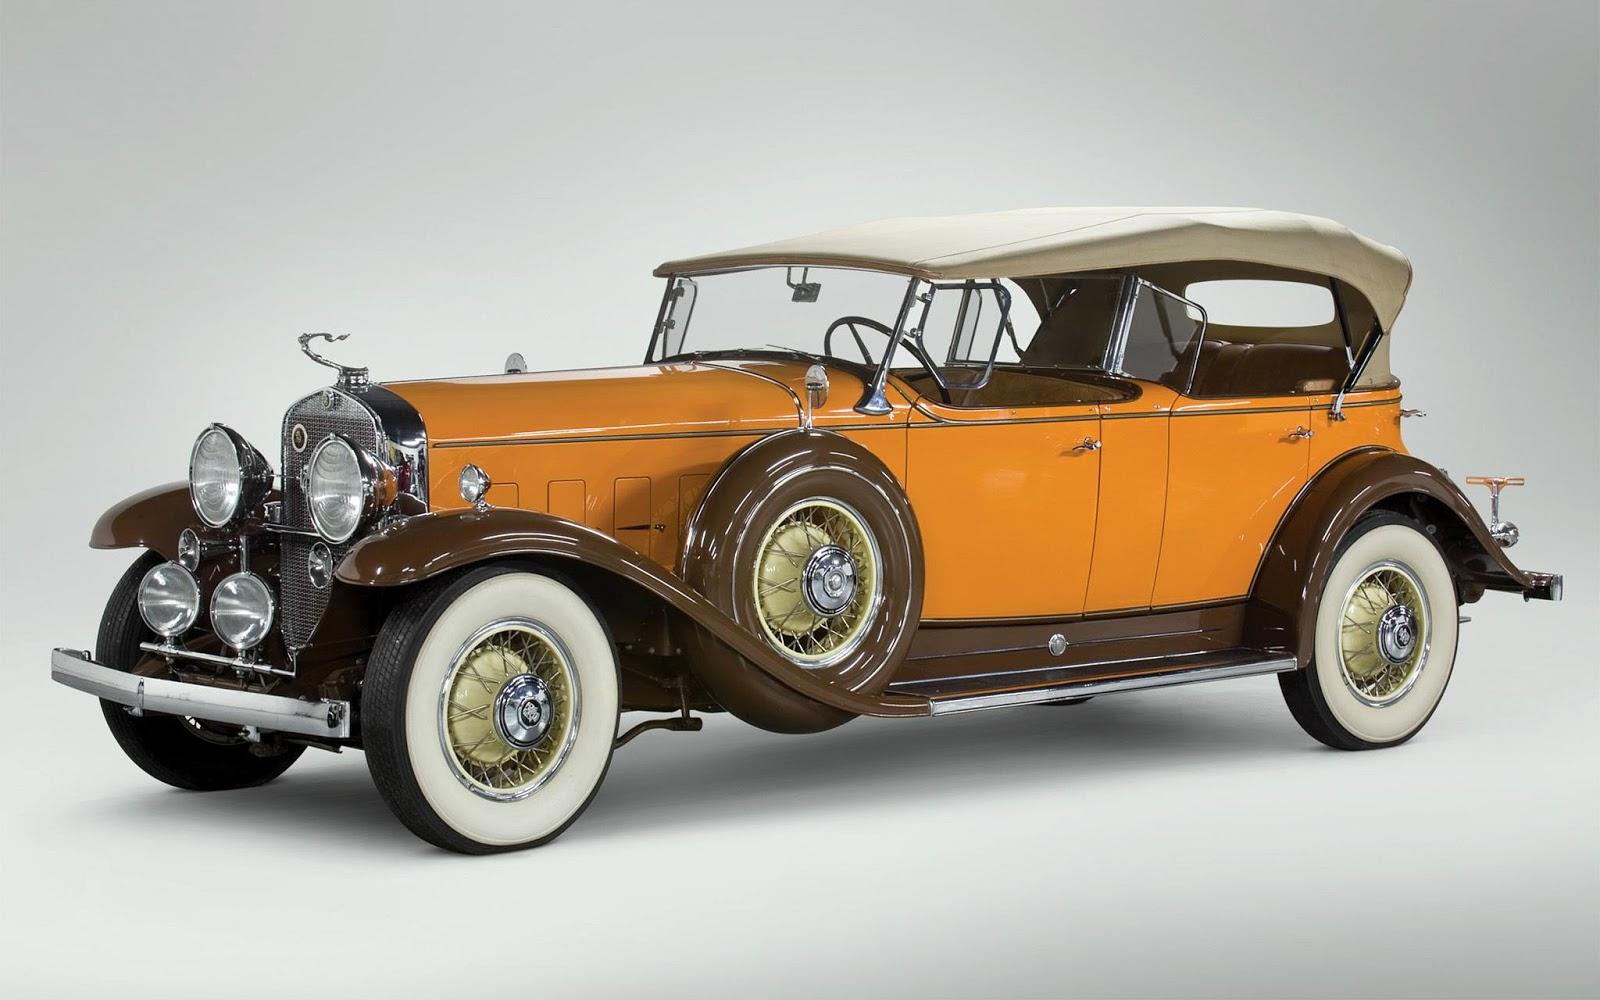 Vehicle design history